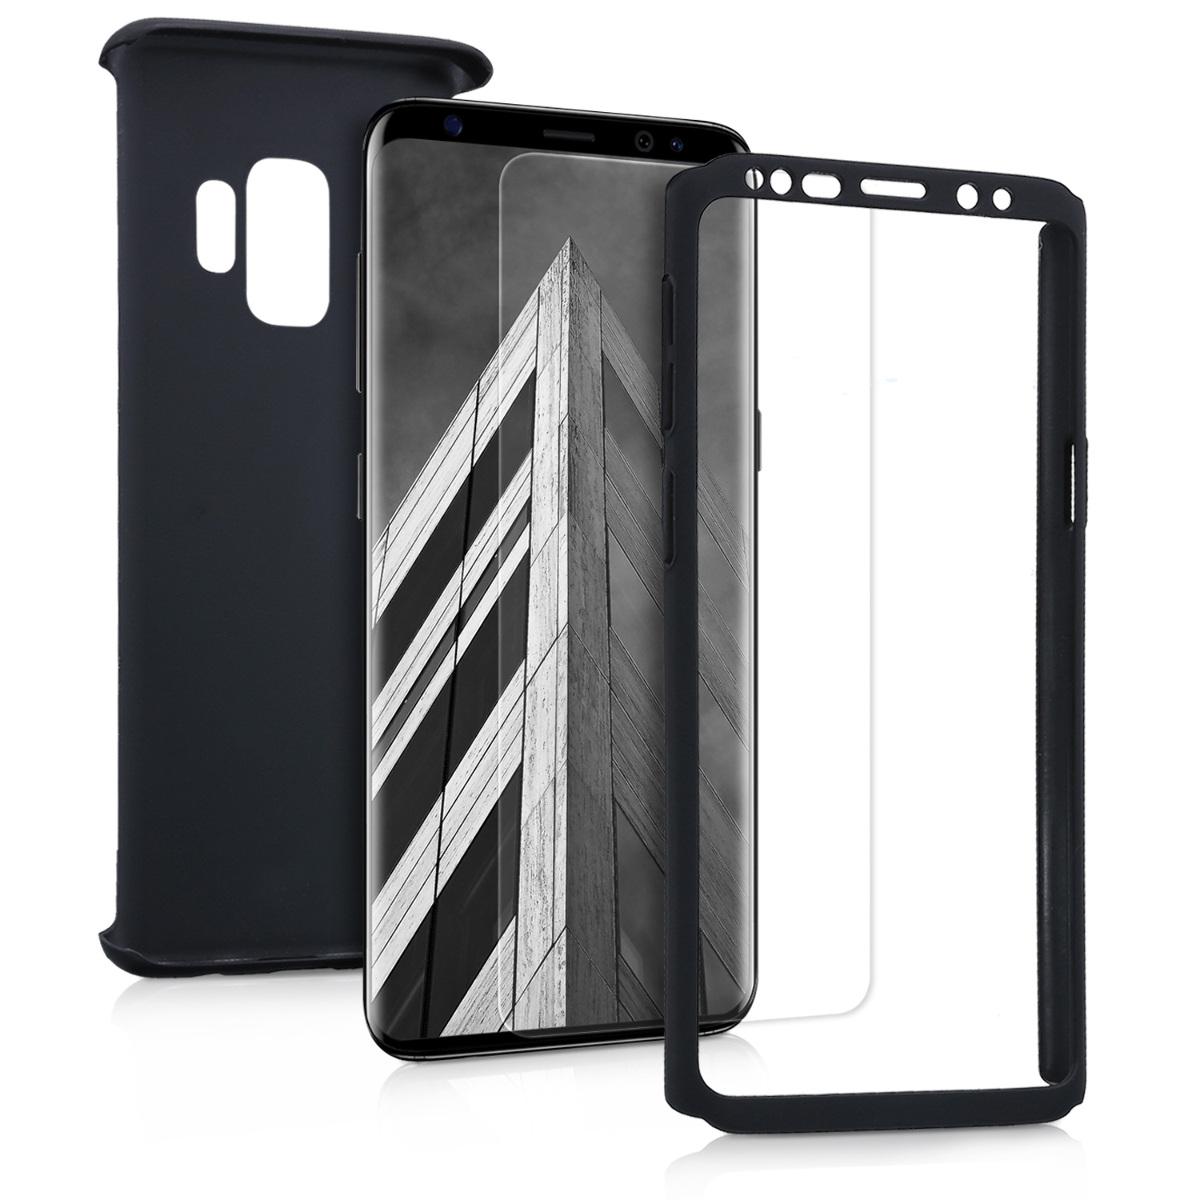 KW Θήκη Full Body για Samsung Galaxy S9 & Screen Protector - Metallic Black (44465.68)